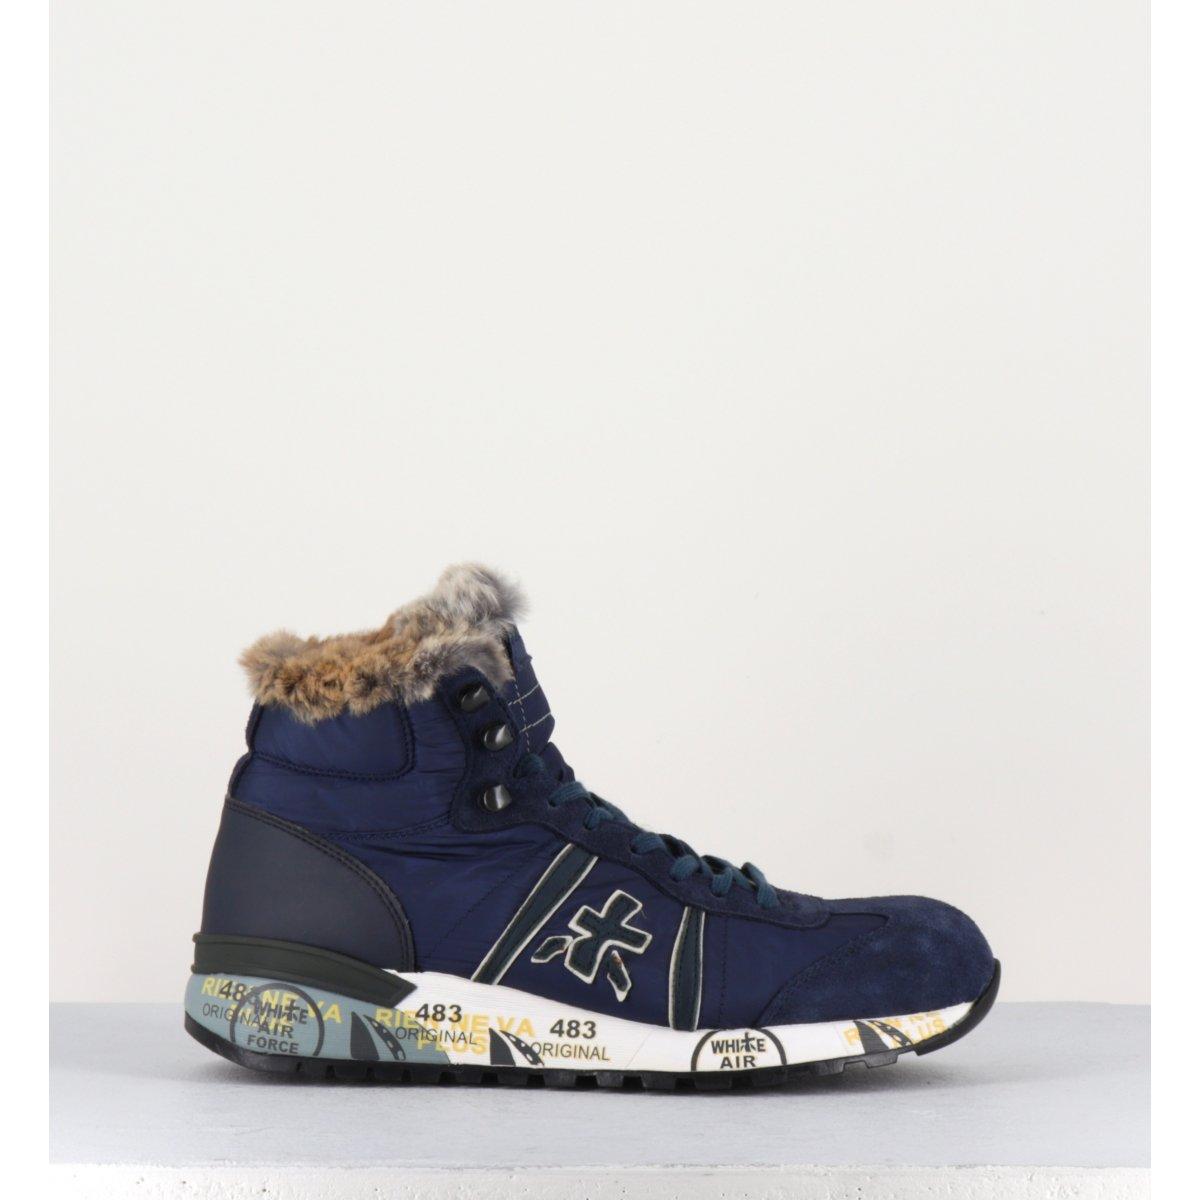 Sneakers montante fourrée en cuir bleue ALAN2637 - Premiata